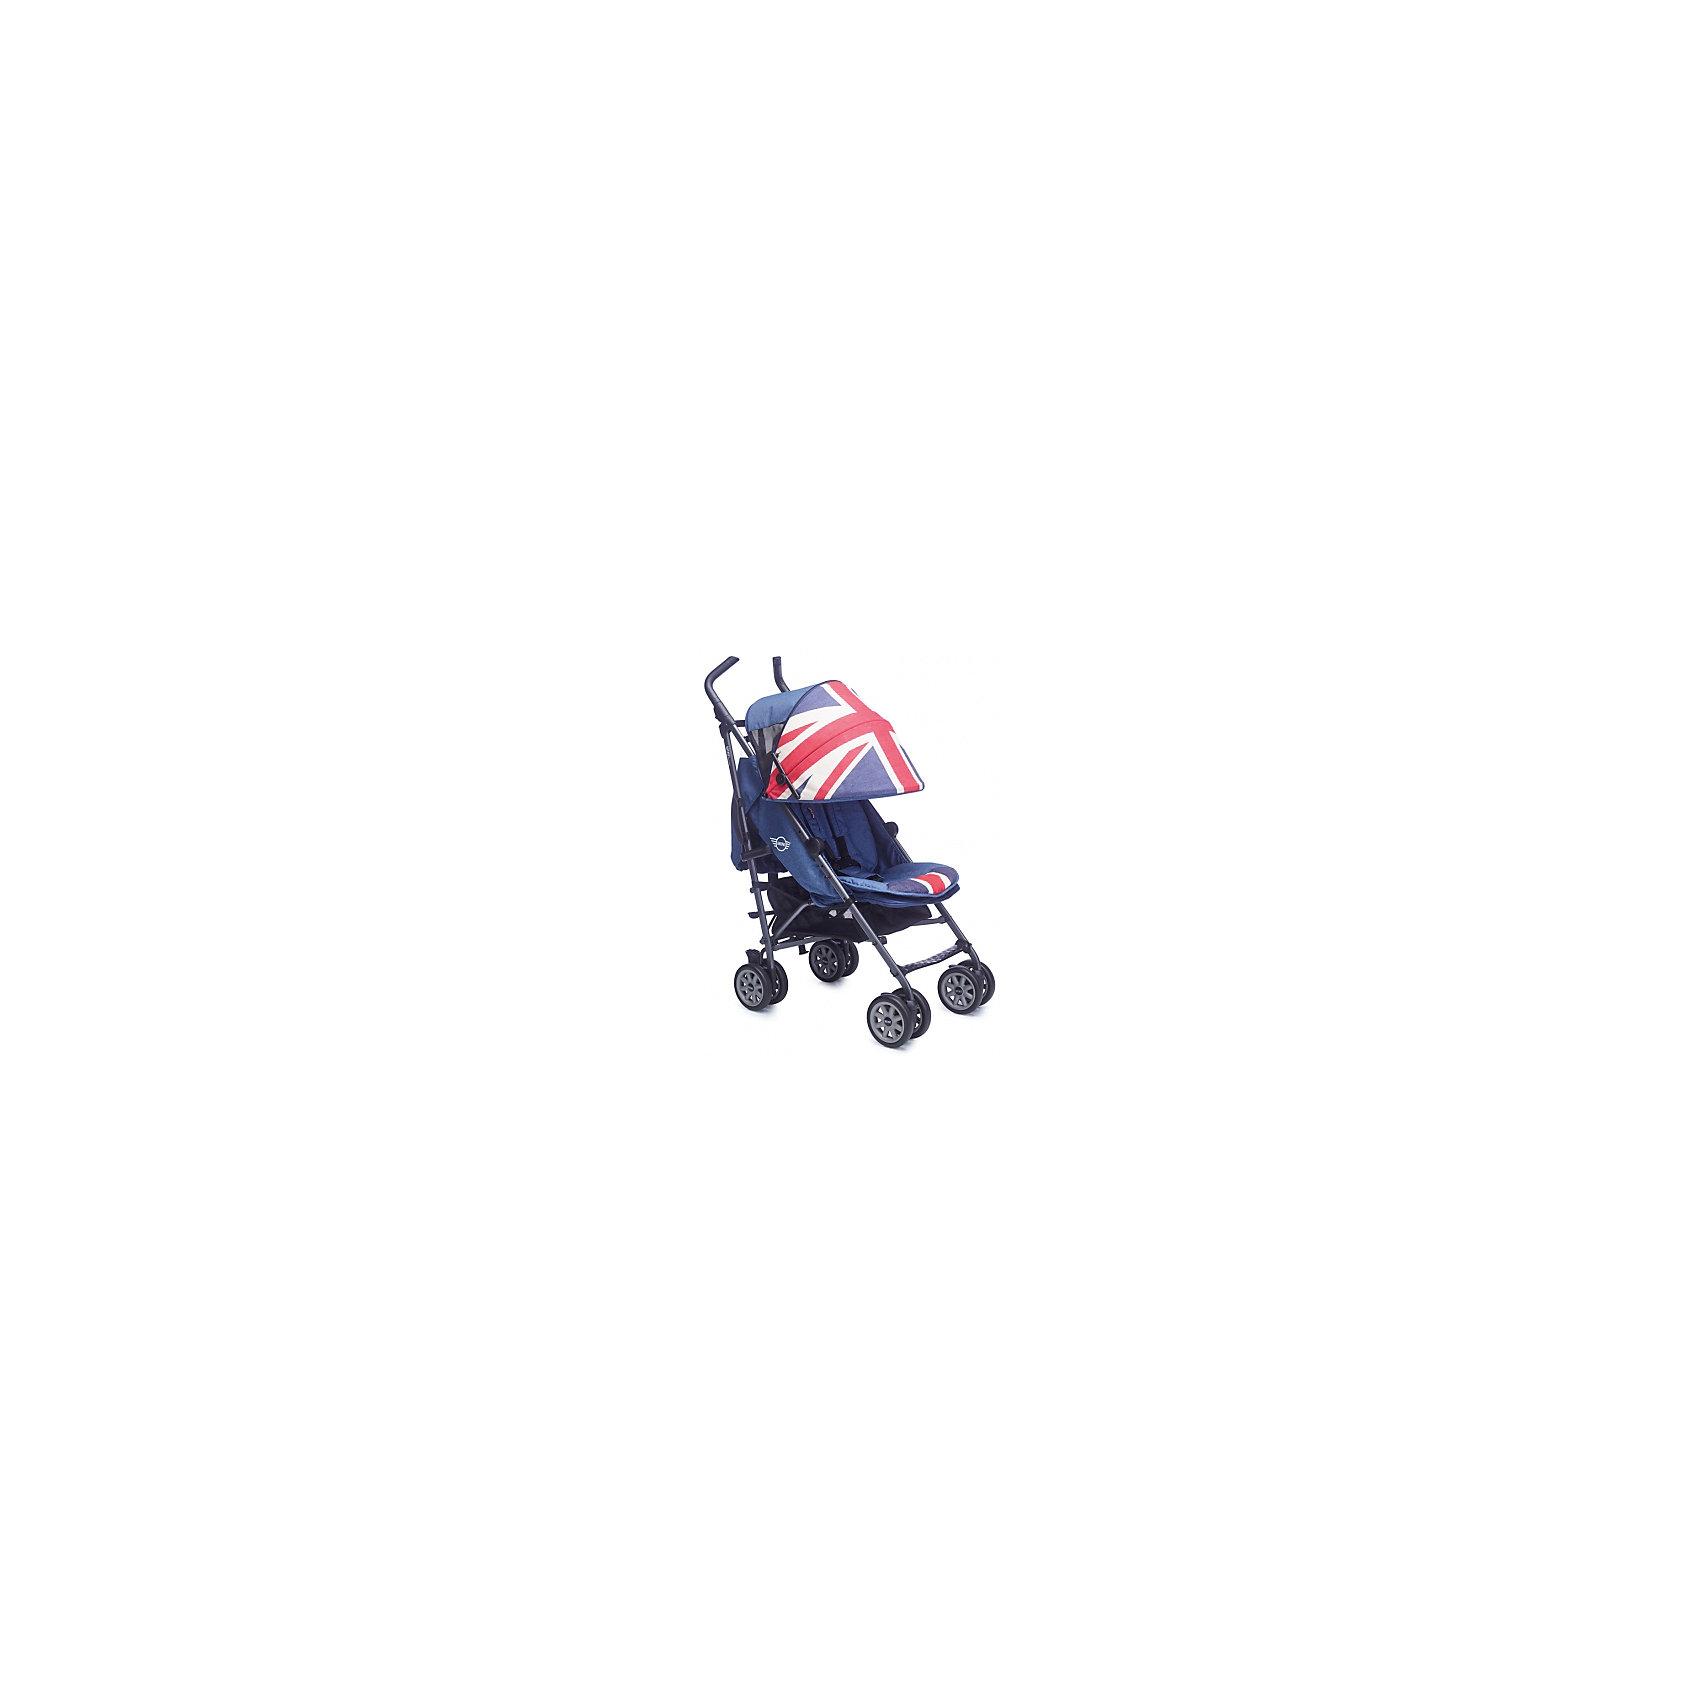 Коляска-трость Easywalker MINI XL Union Jack Vintage, peatКоляски-трости<br>EMB20021 Коляска MINI by Easywalker buggy XL Union Jack Vintage + EB10102 Бампер Easywalker buggy bumper bar Peat<br><br>Ширина мм: 1020<br>Глубина мм: 230<br>Высота мм: 280<br>Вес г: 9740<br>Возраст от месяцев: 0<br>Возраст до месяцев: 48<br>Пол: Унисекс<br>Возраст: Детский<br>SKU: 5613102